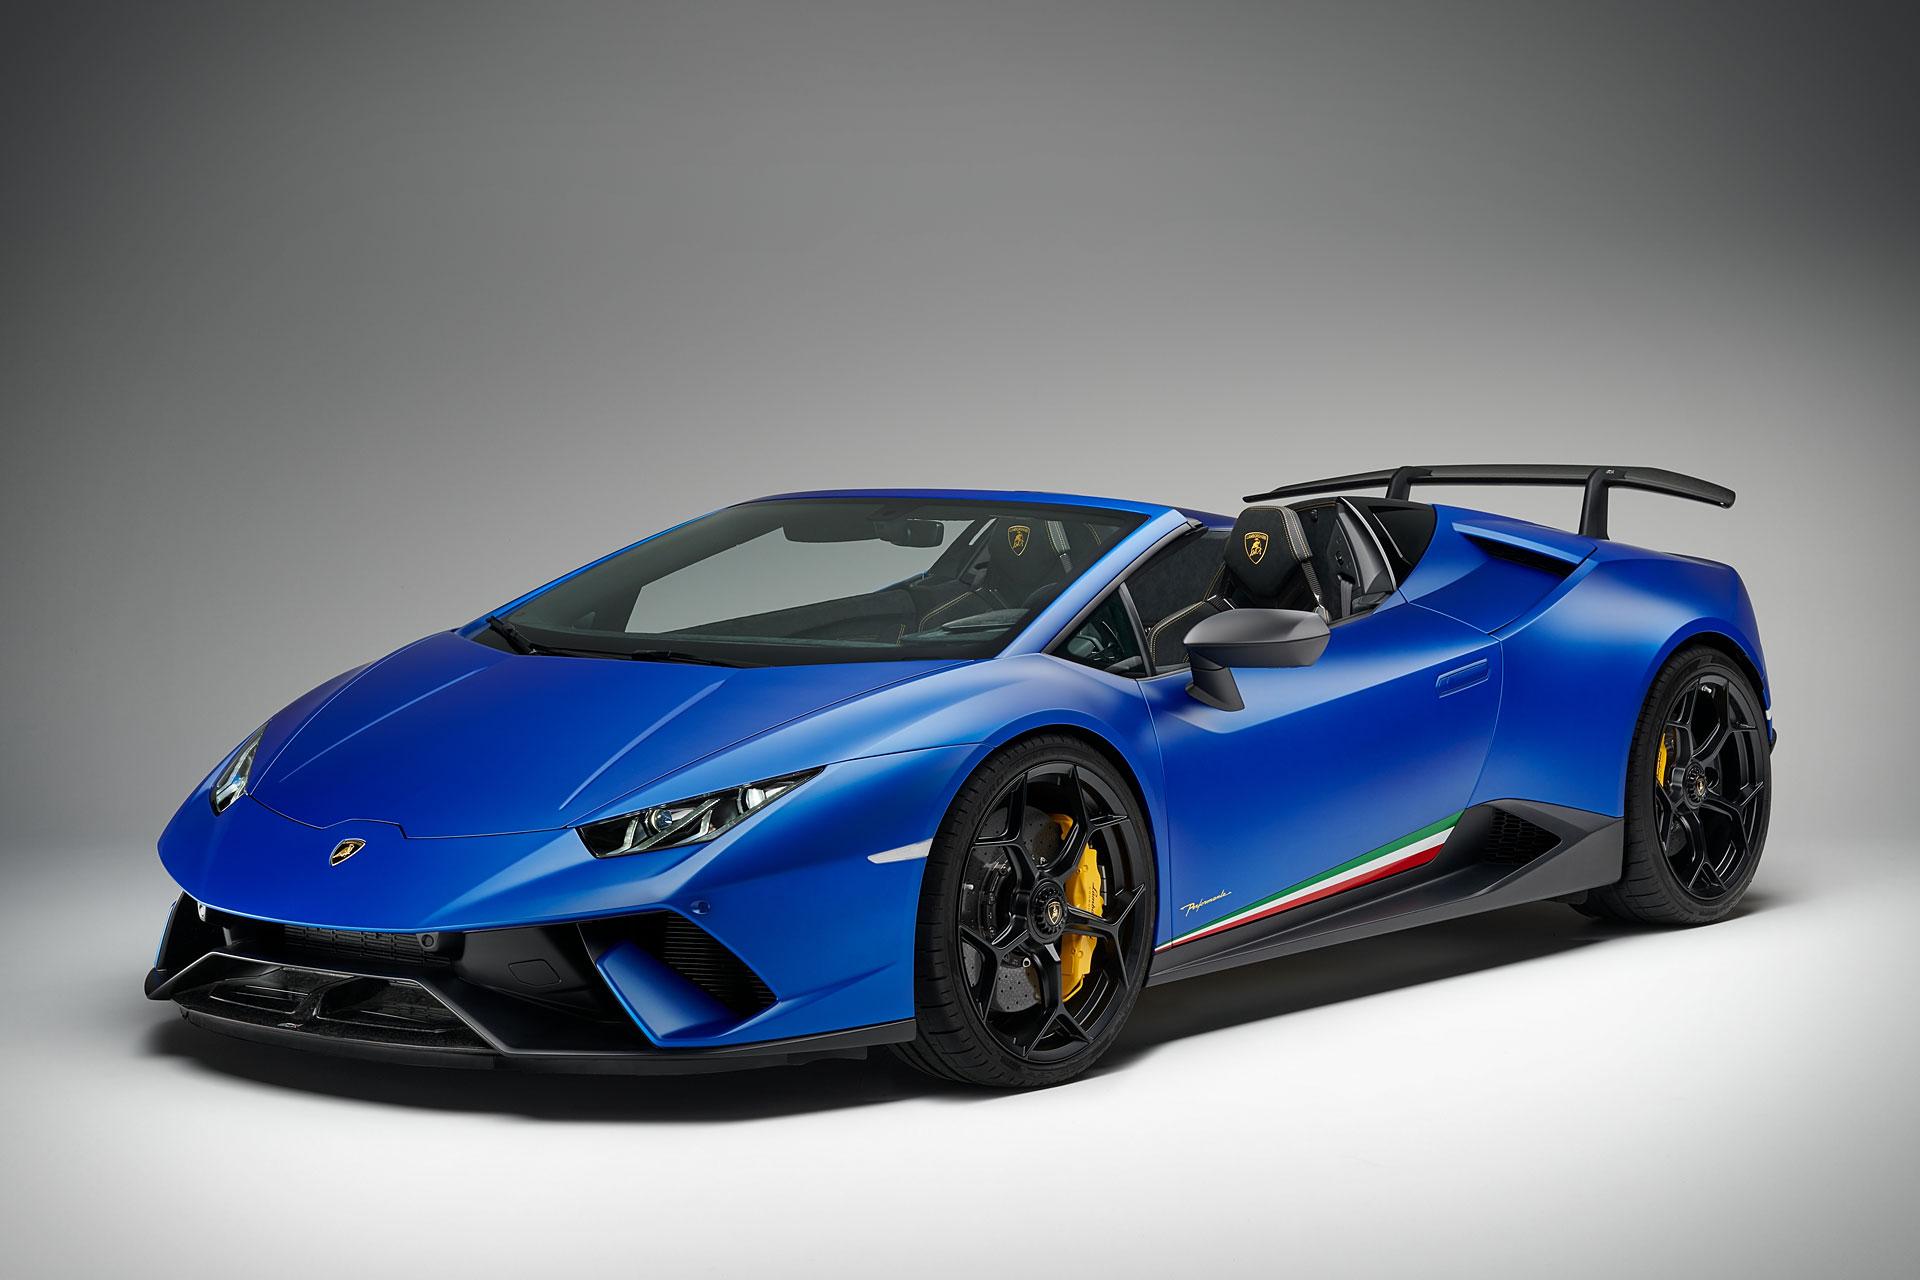 Fixed Gear Wallpaper Iphone Lamborghini Huracan Performante Spyder Uncrate